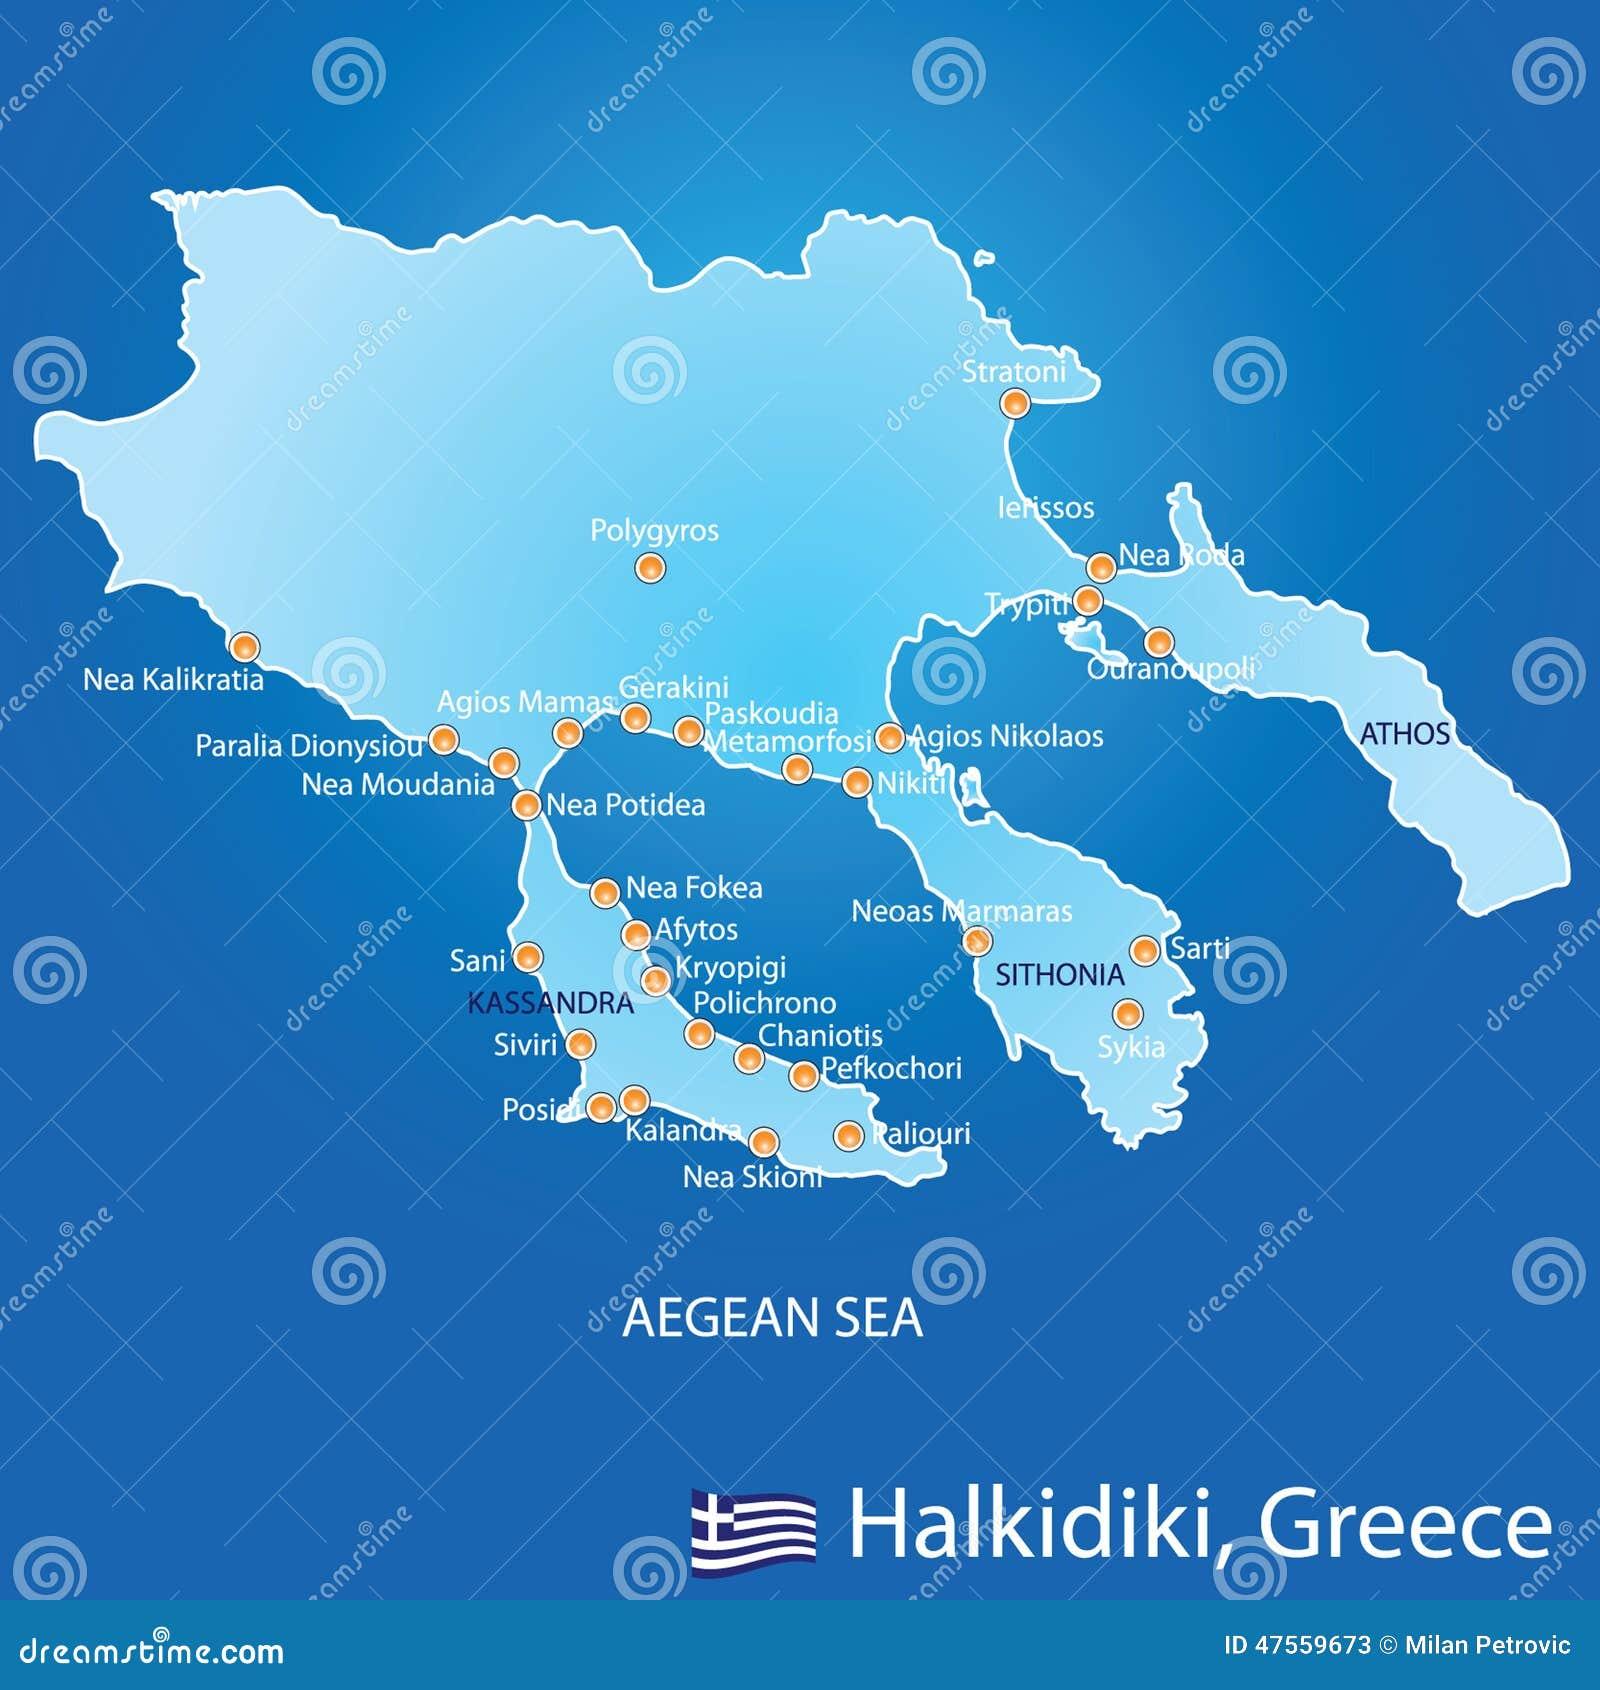 Peninsula Of Halkidiki In Greece Map Stock Vector   Illustration